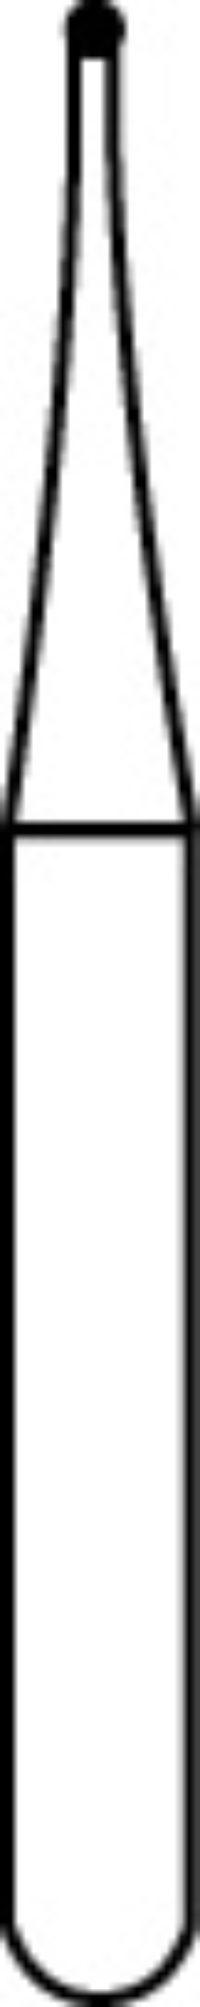 CLOSEOUT SALE: 8 Round Carbide